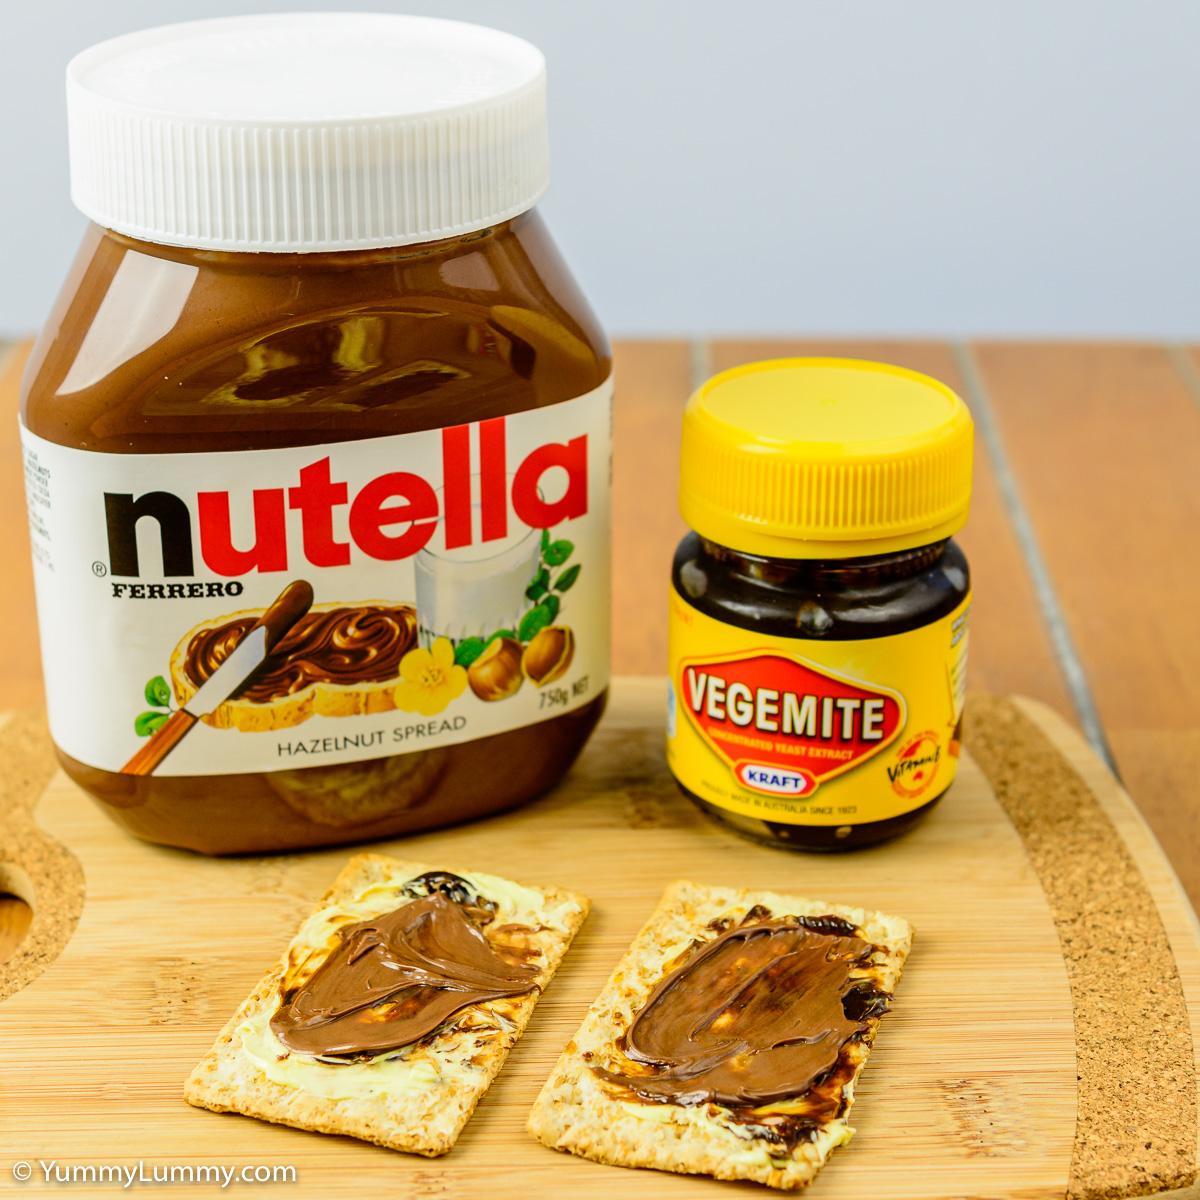 Saturday afternoon tea. My version of chocolate Vegemite. Nutella and Vegemite on a VitaWeat biscuit.